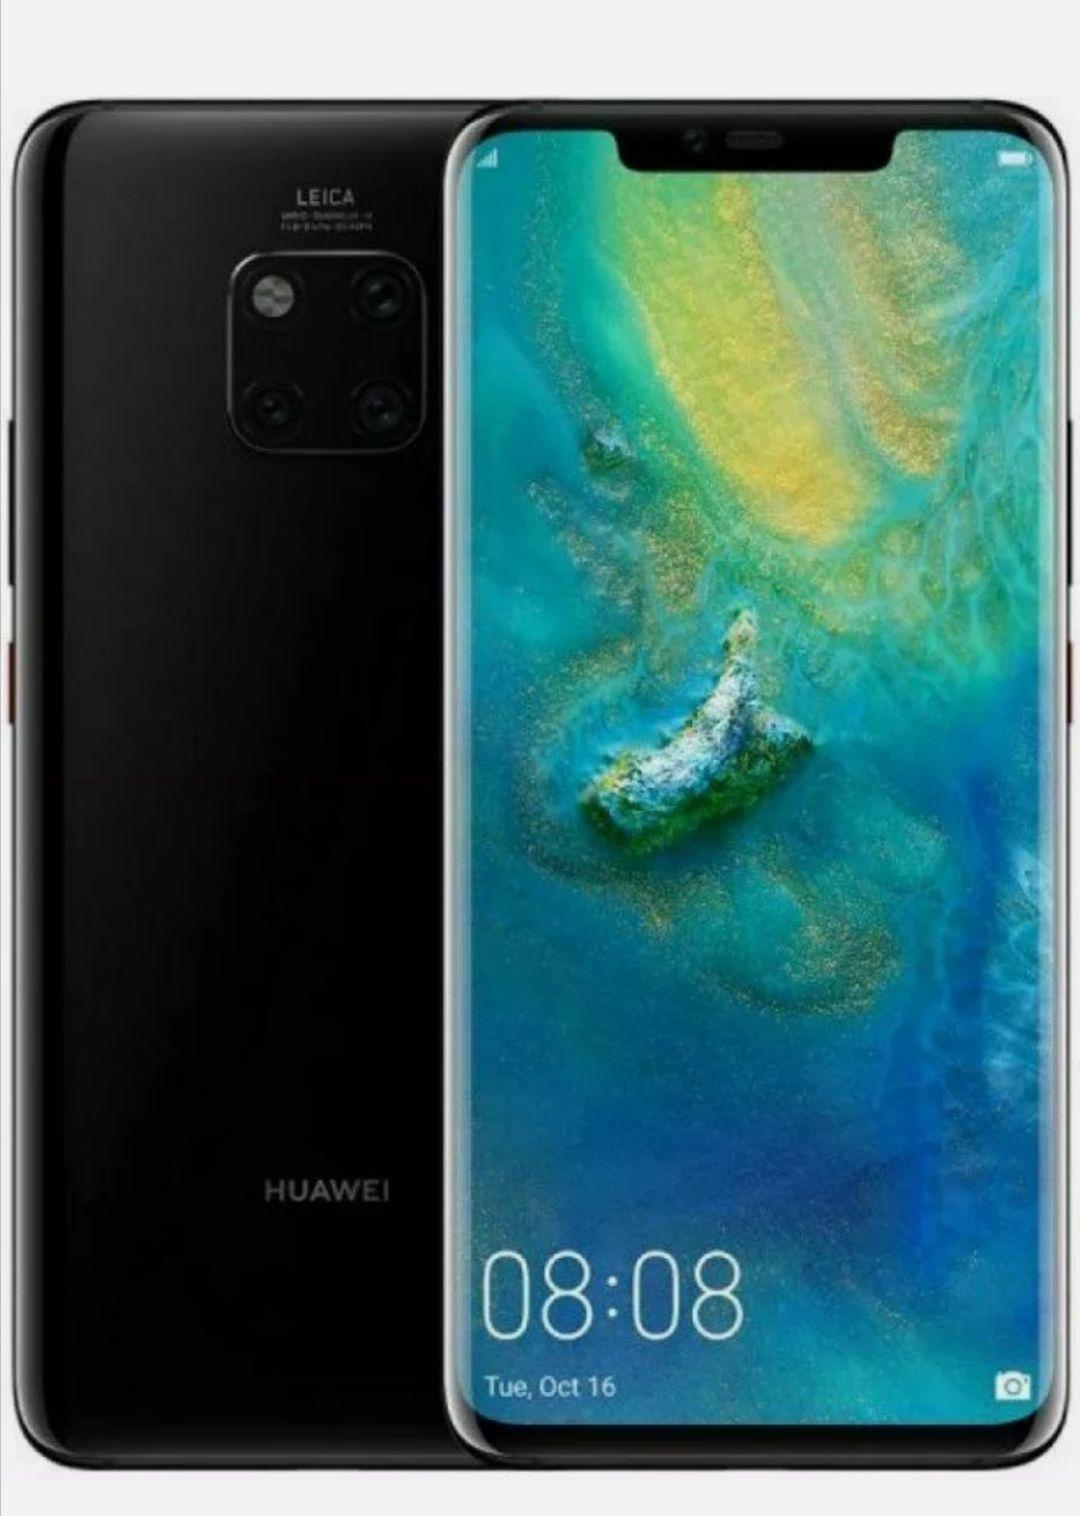 Huawei Mate 20 Pro LYA-L09 128GB 40MP Mobile Smartphone Black EE grade C £124.99 @ xsitems_ltd / ebay